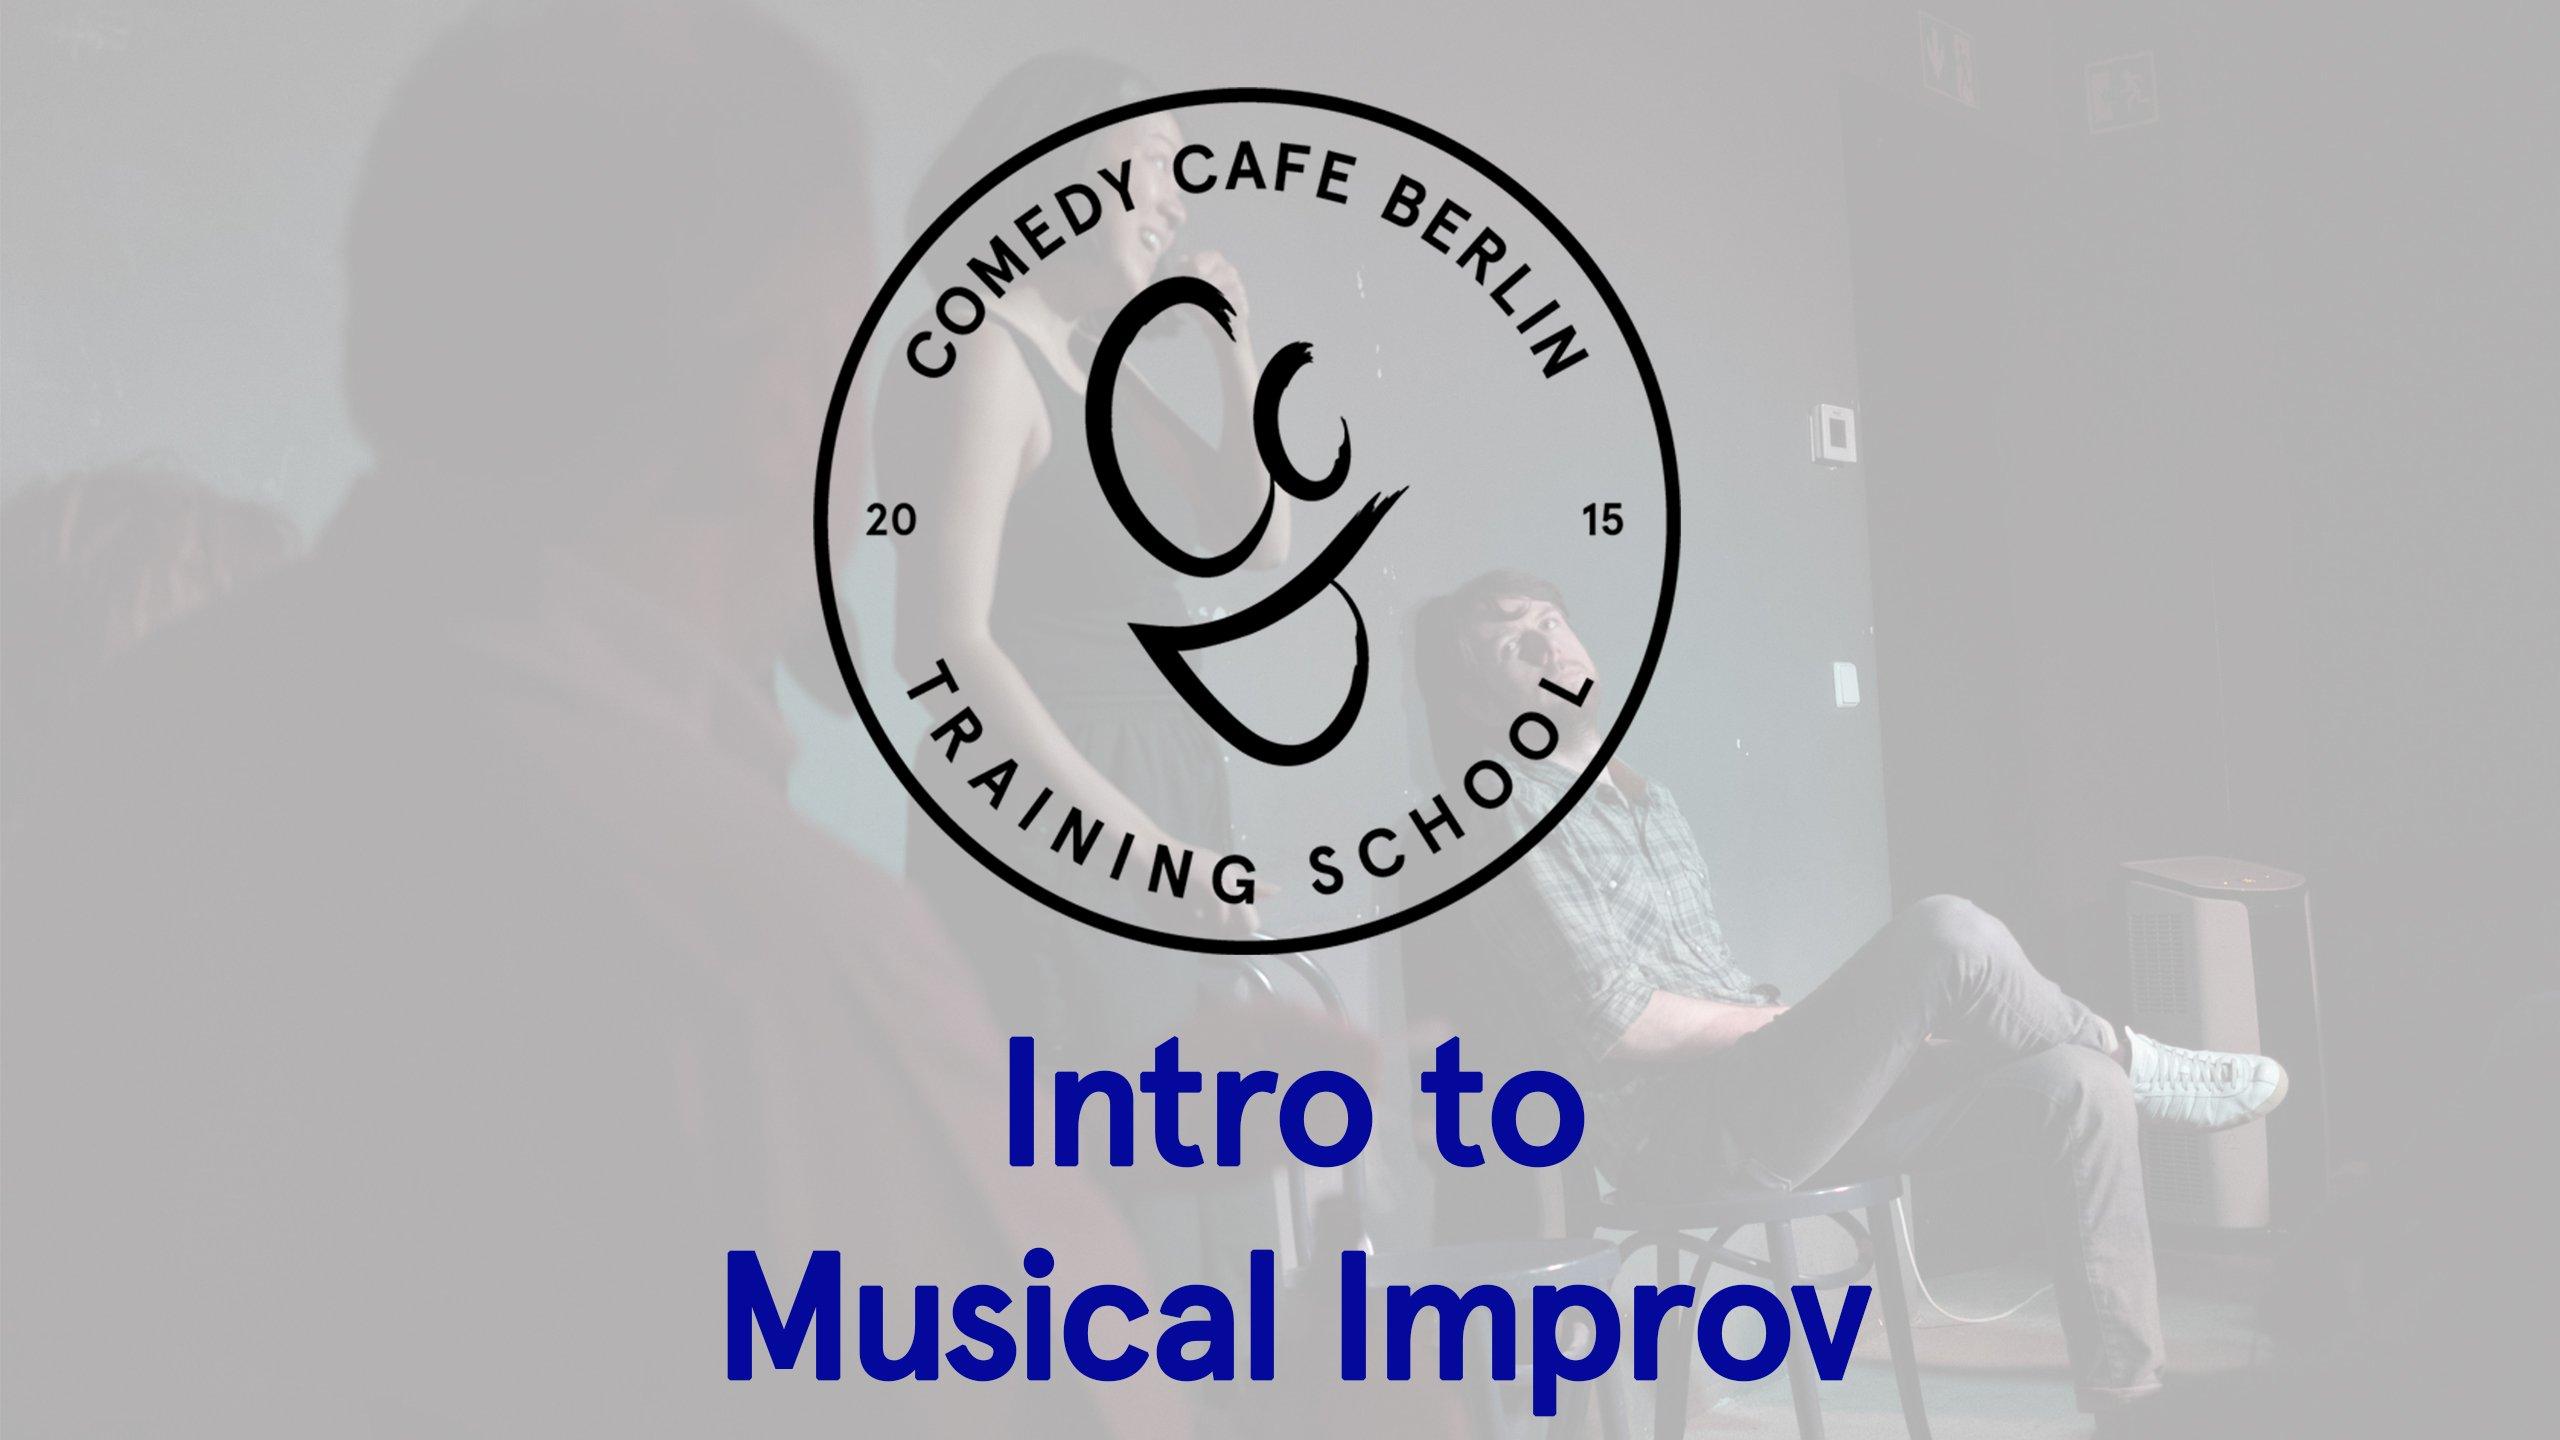 Intro to Musical Improv